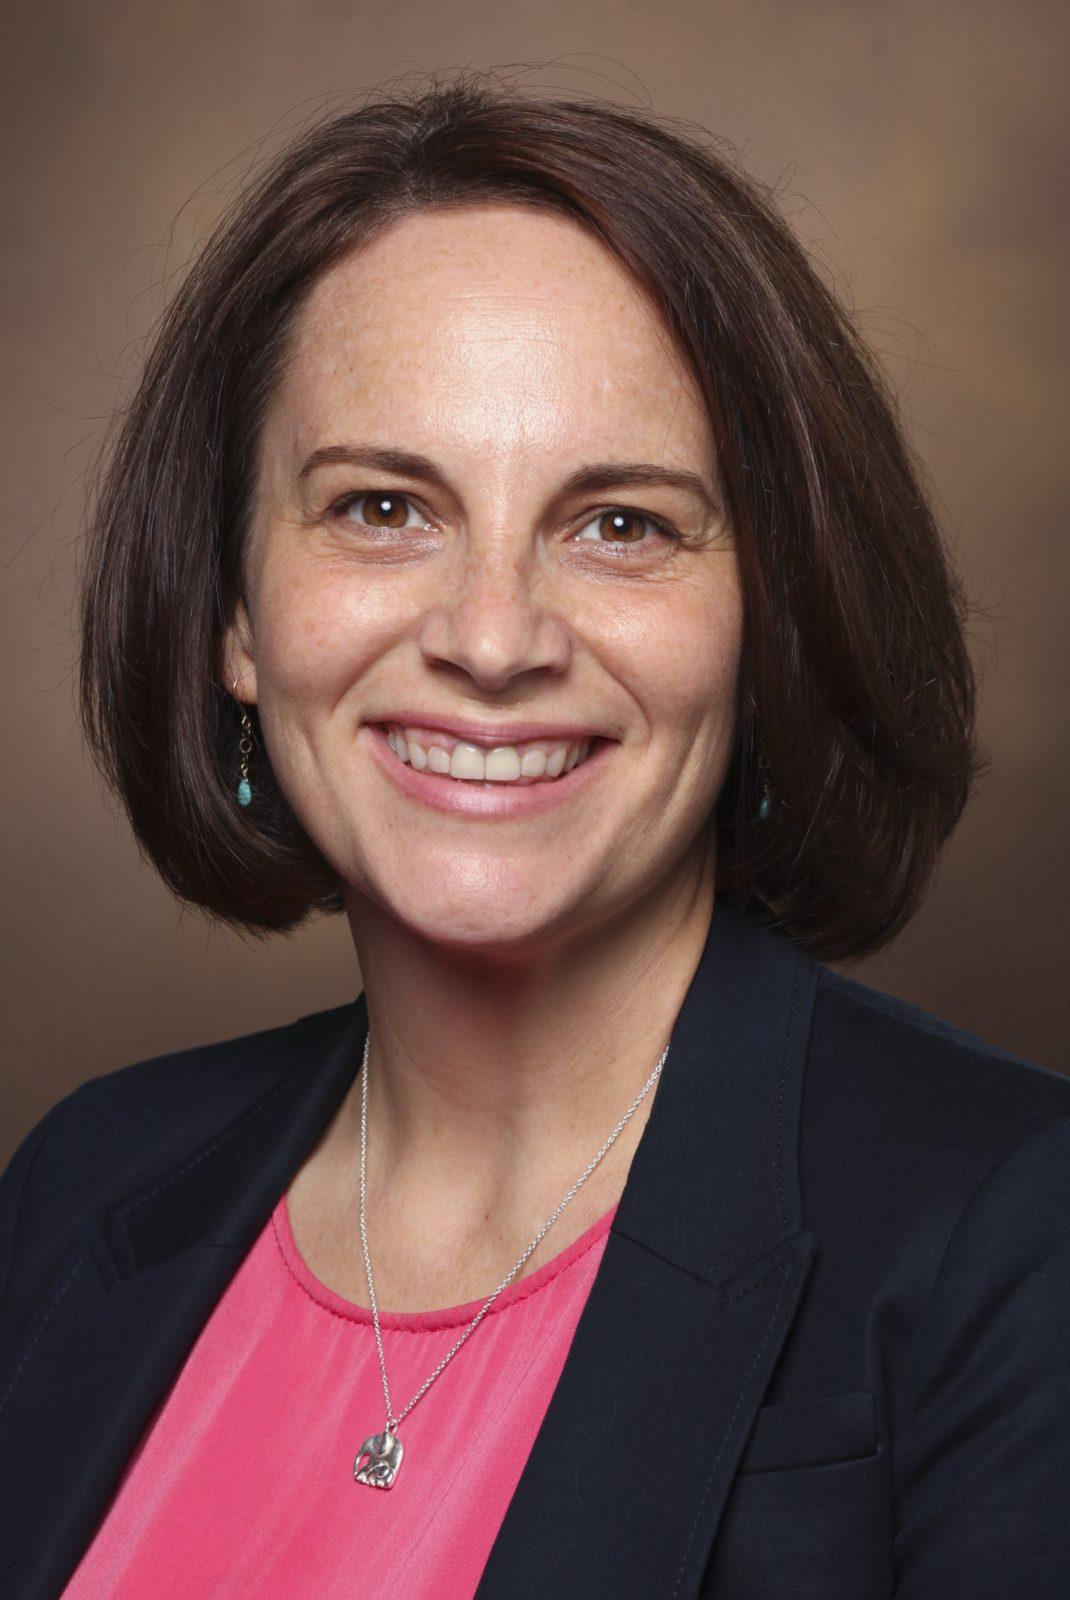 Tara McKay, assistant professor of medicine, health and society (Vanderbilt University)